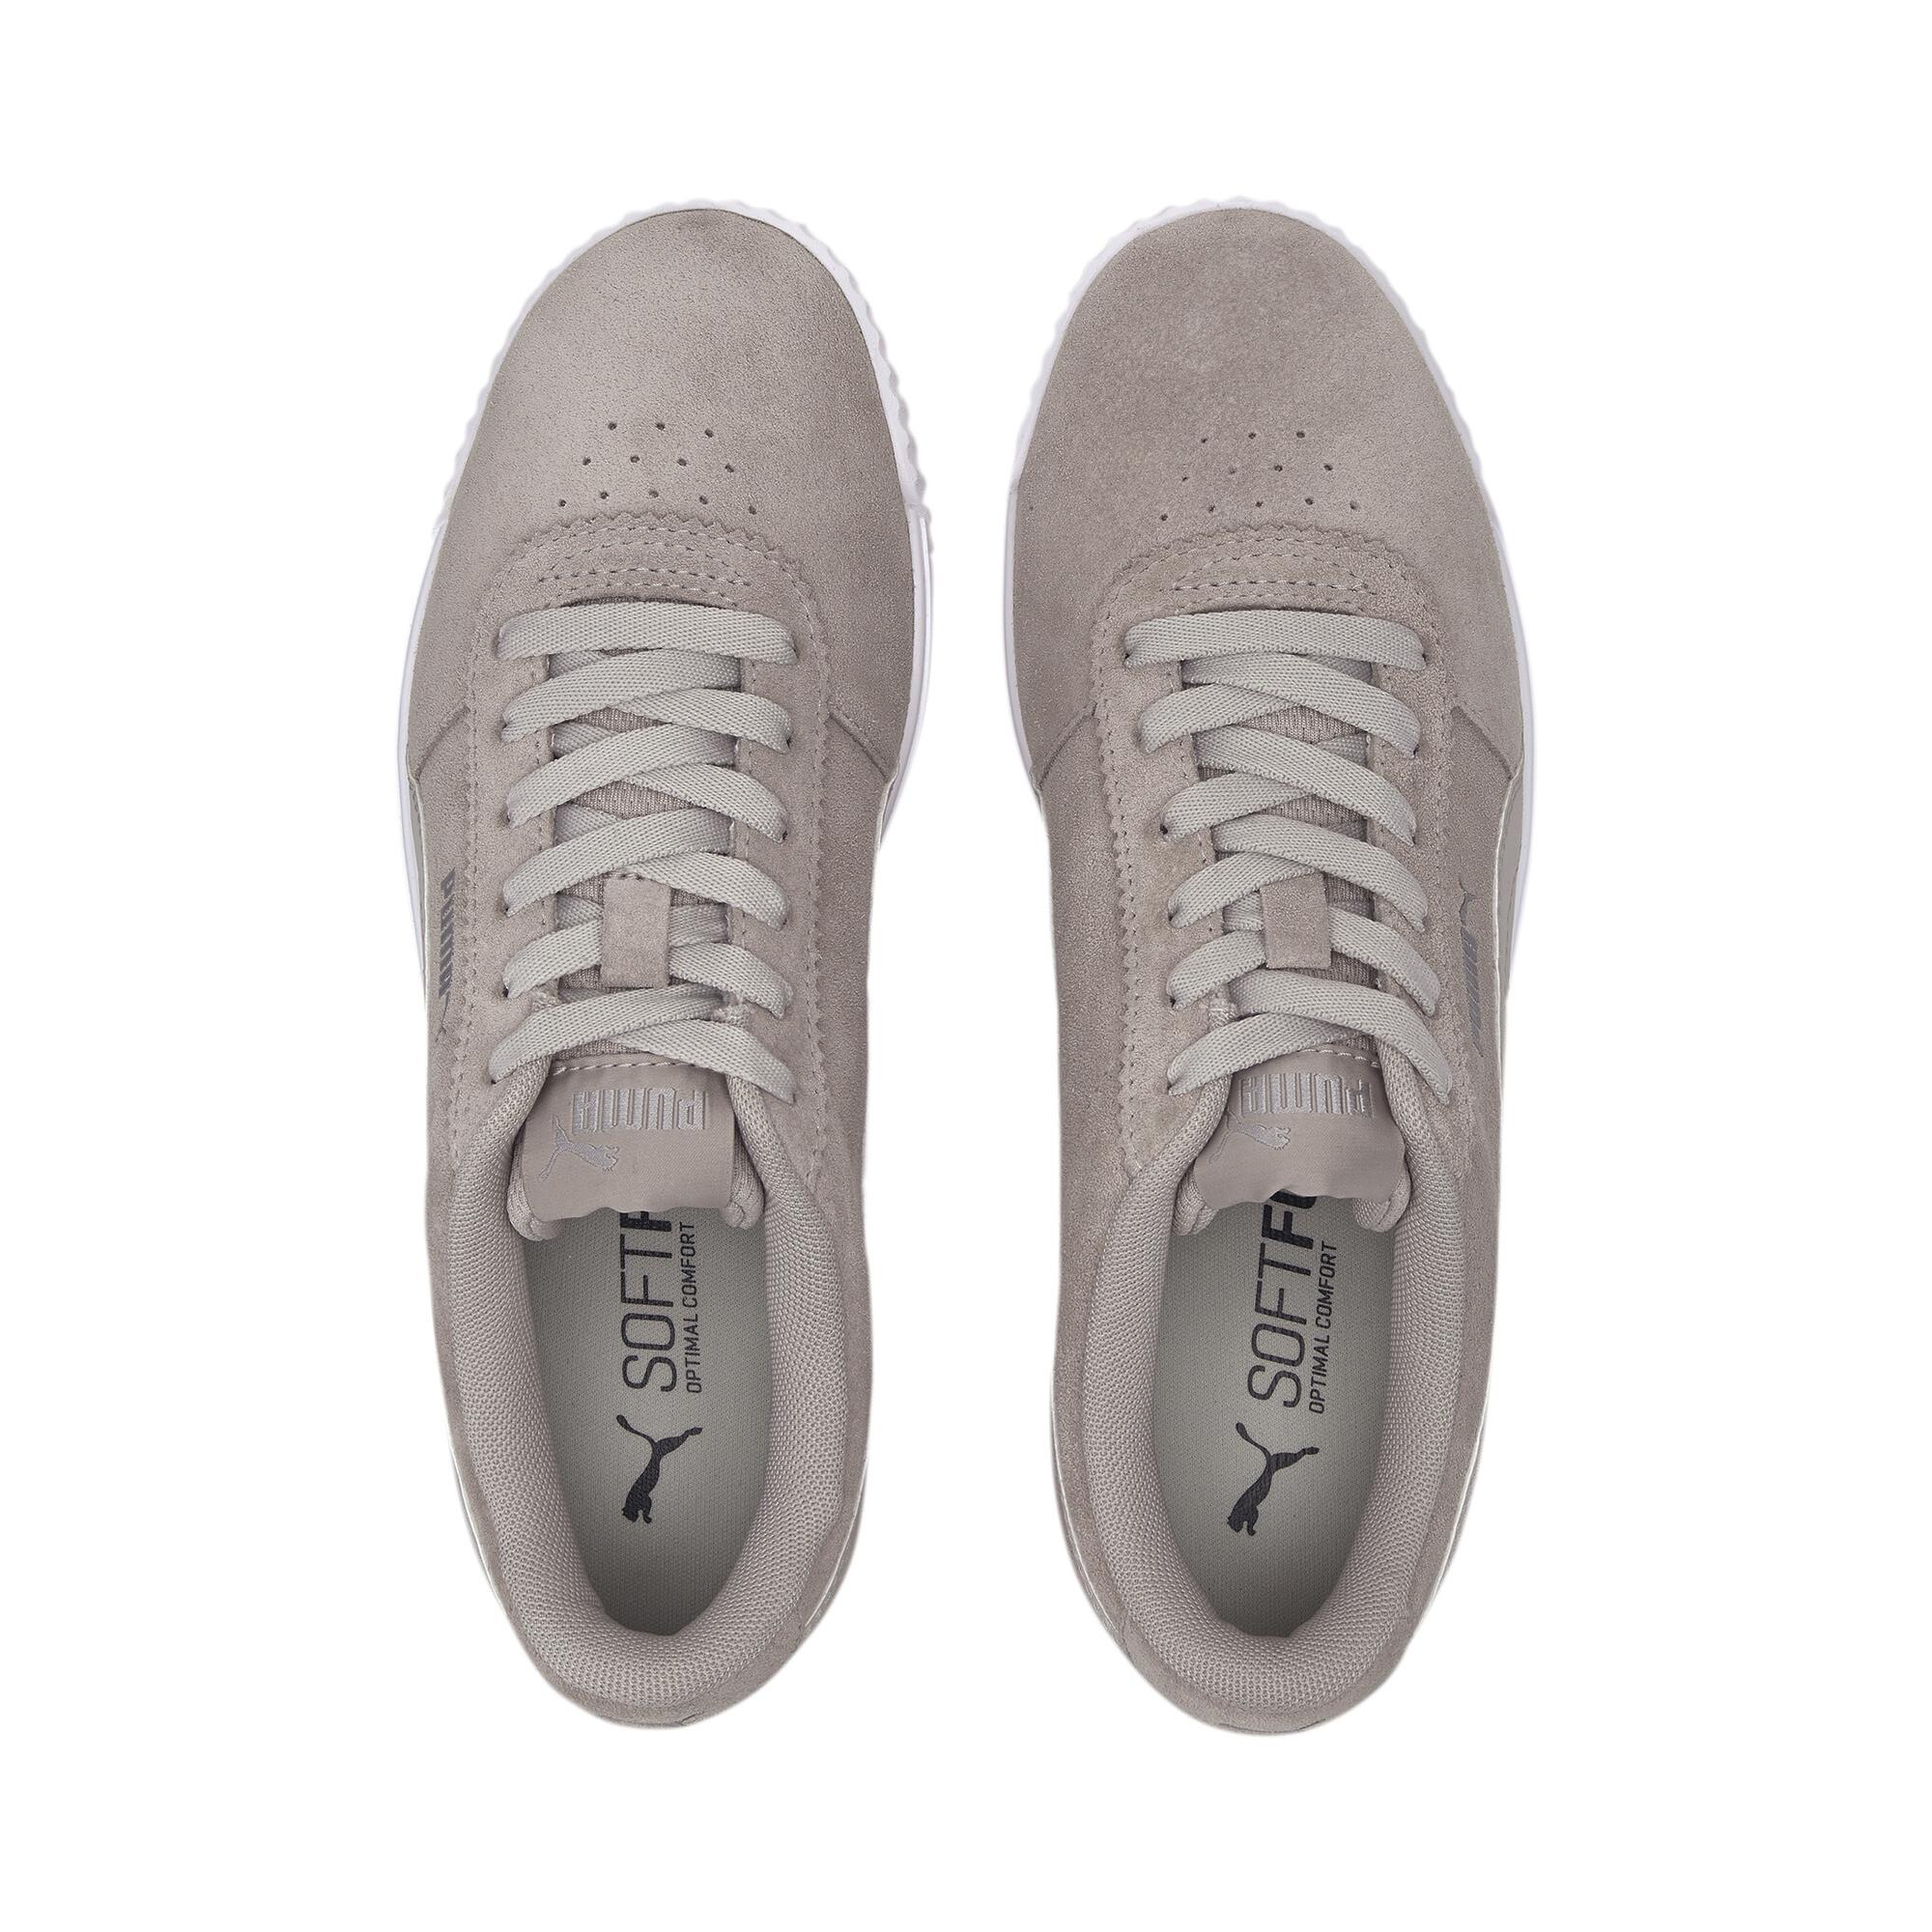 PUMA-Women-039-s-Carina-Slim-Suede-Sneakers thumbnail 8